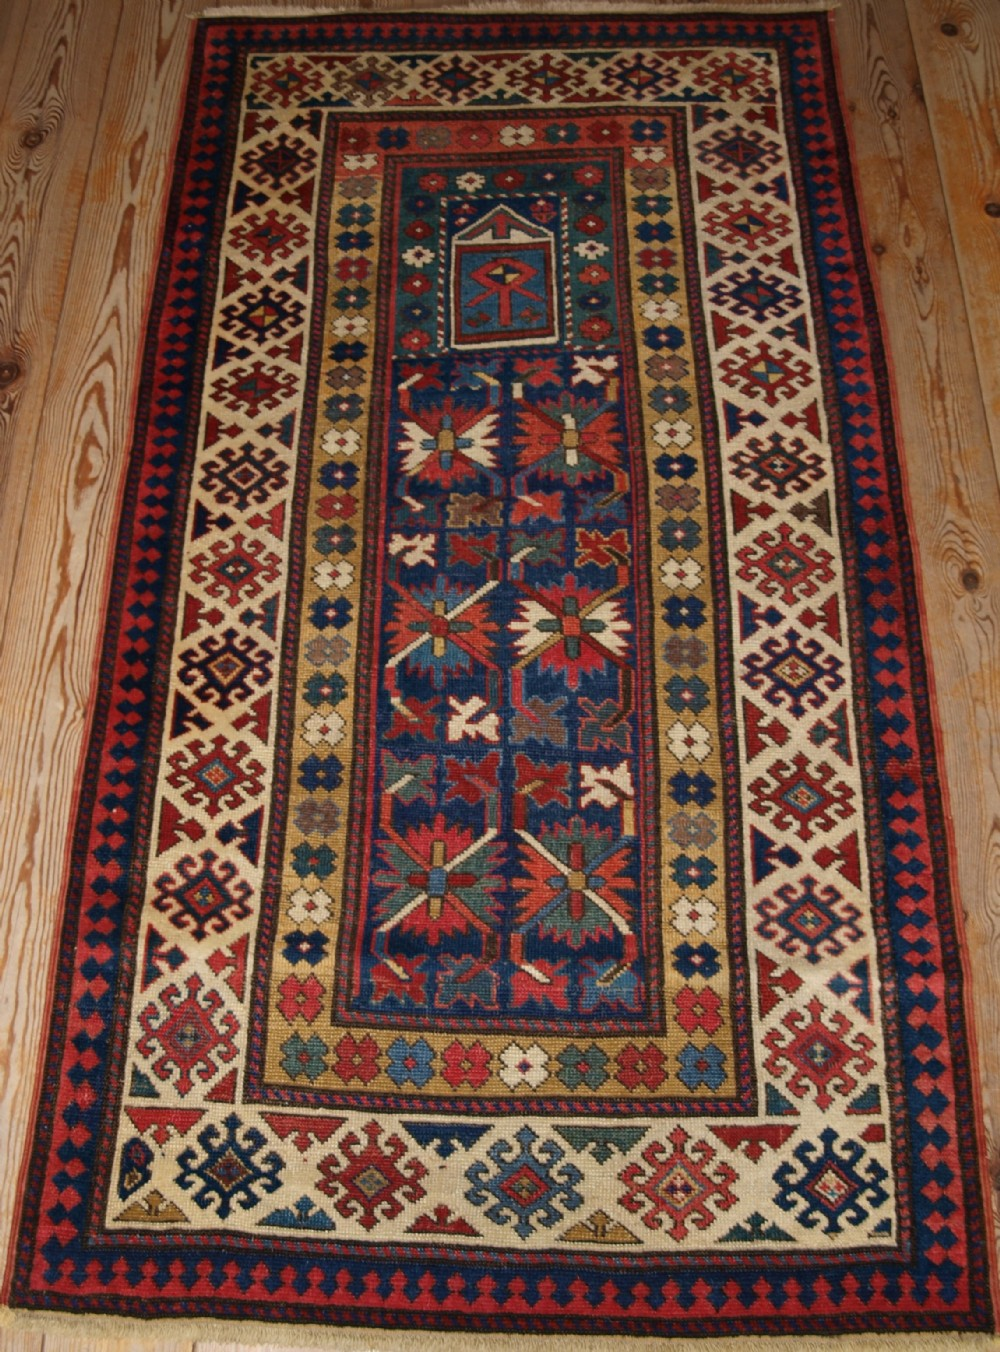 antique caucasian karabagh prayer rug great rug 4th quarter 19th cent